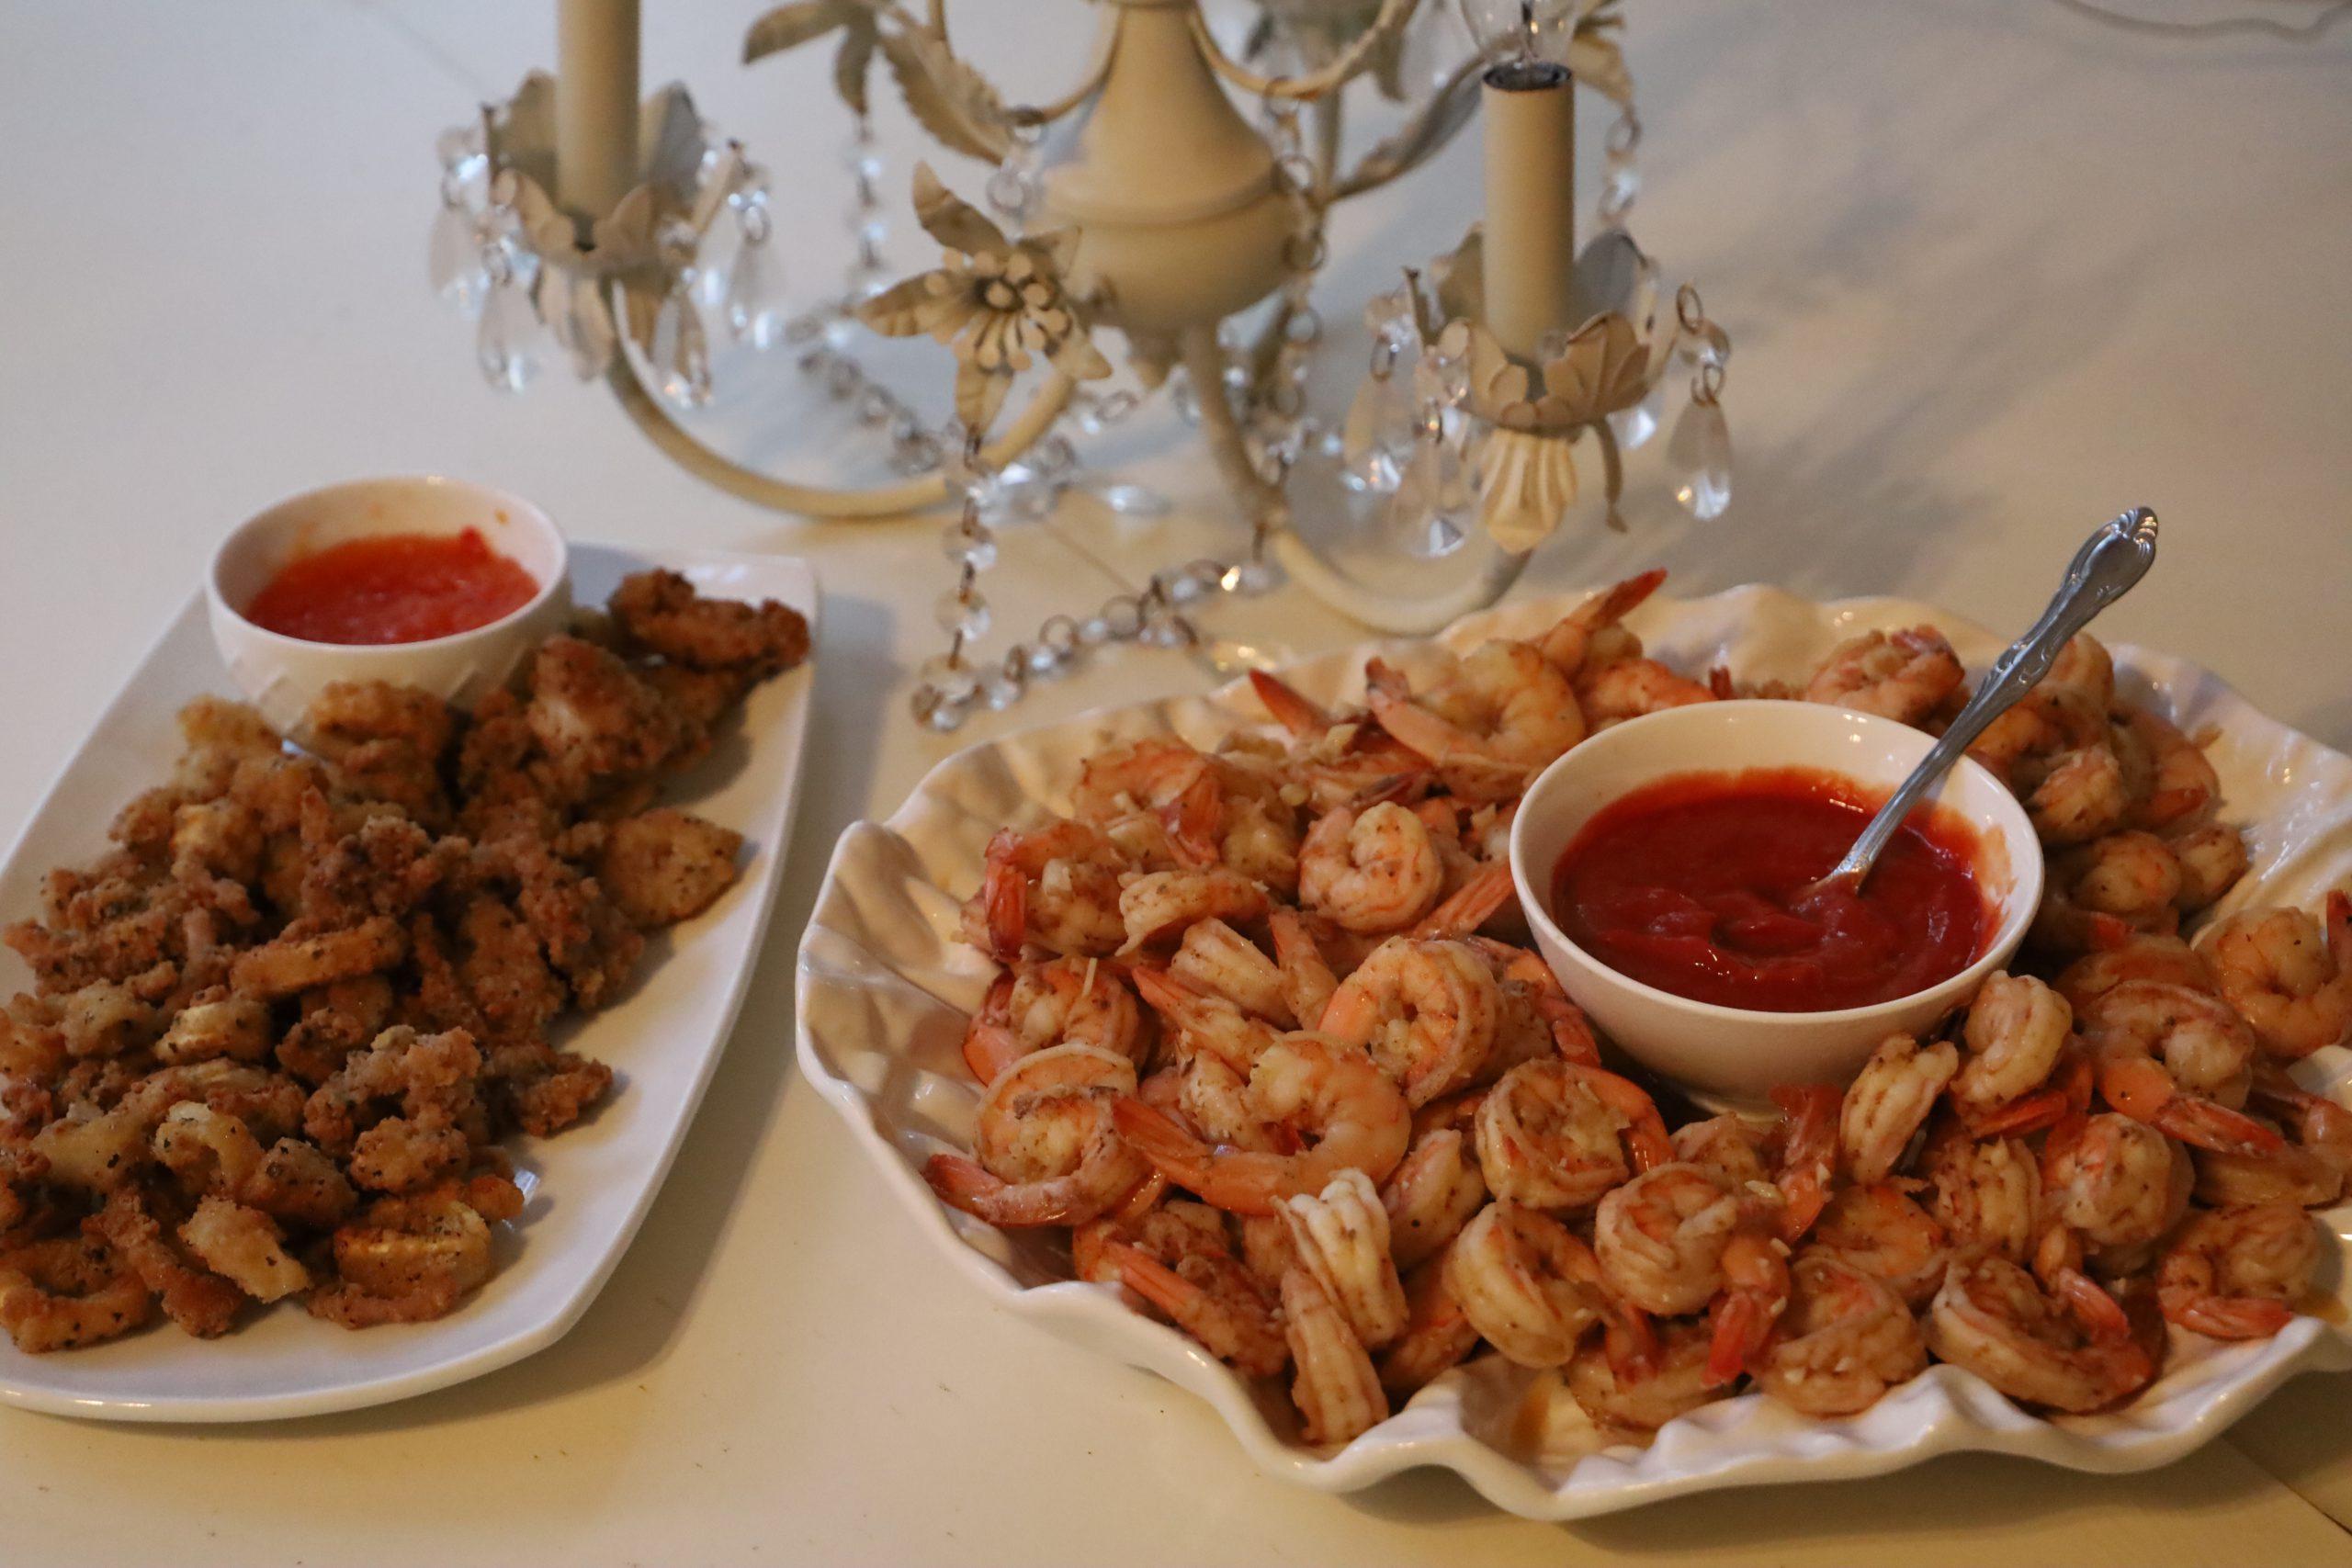 Gordon and Julie Seafood